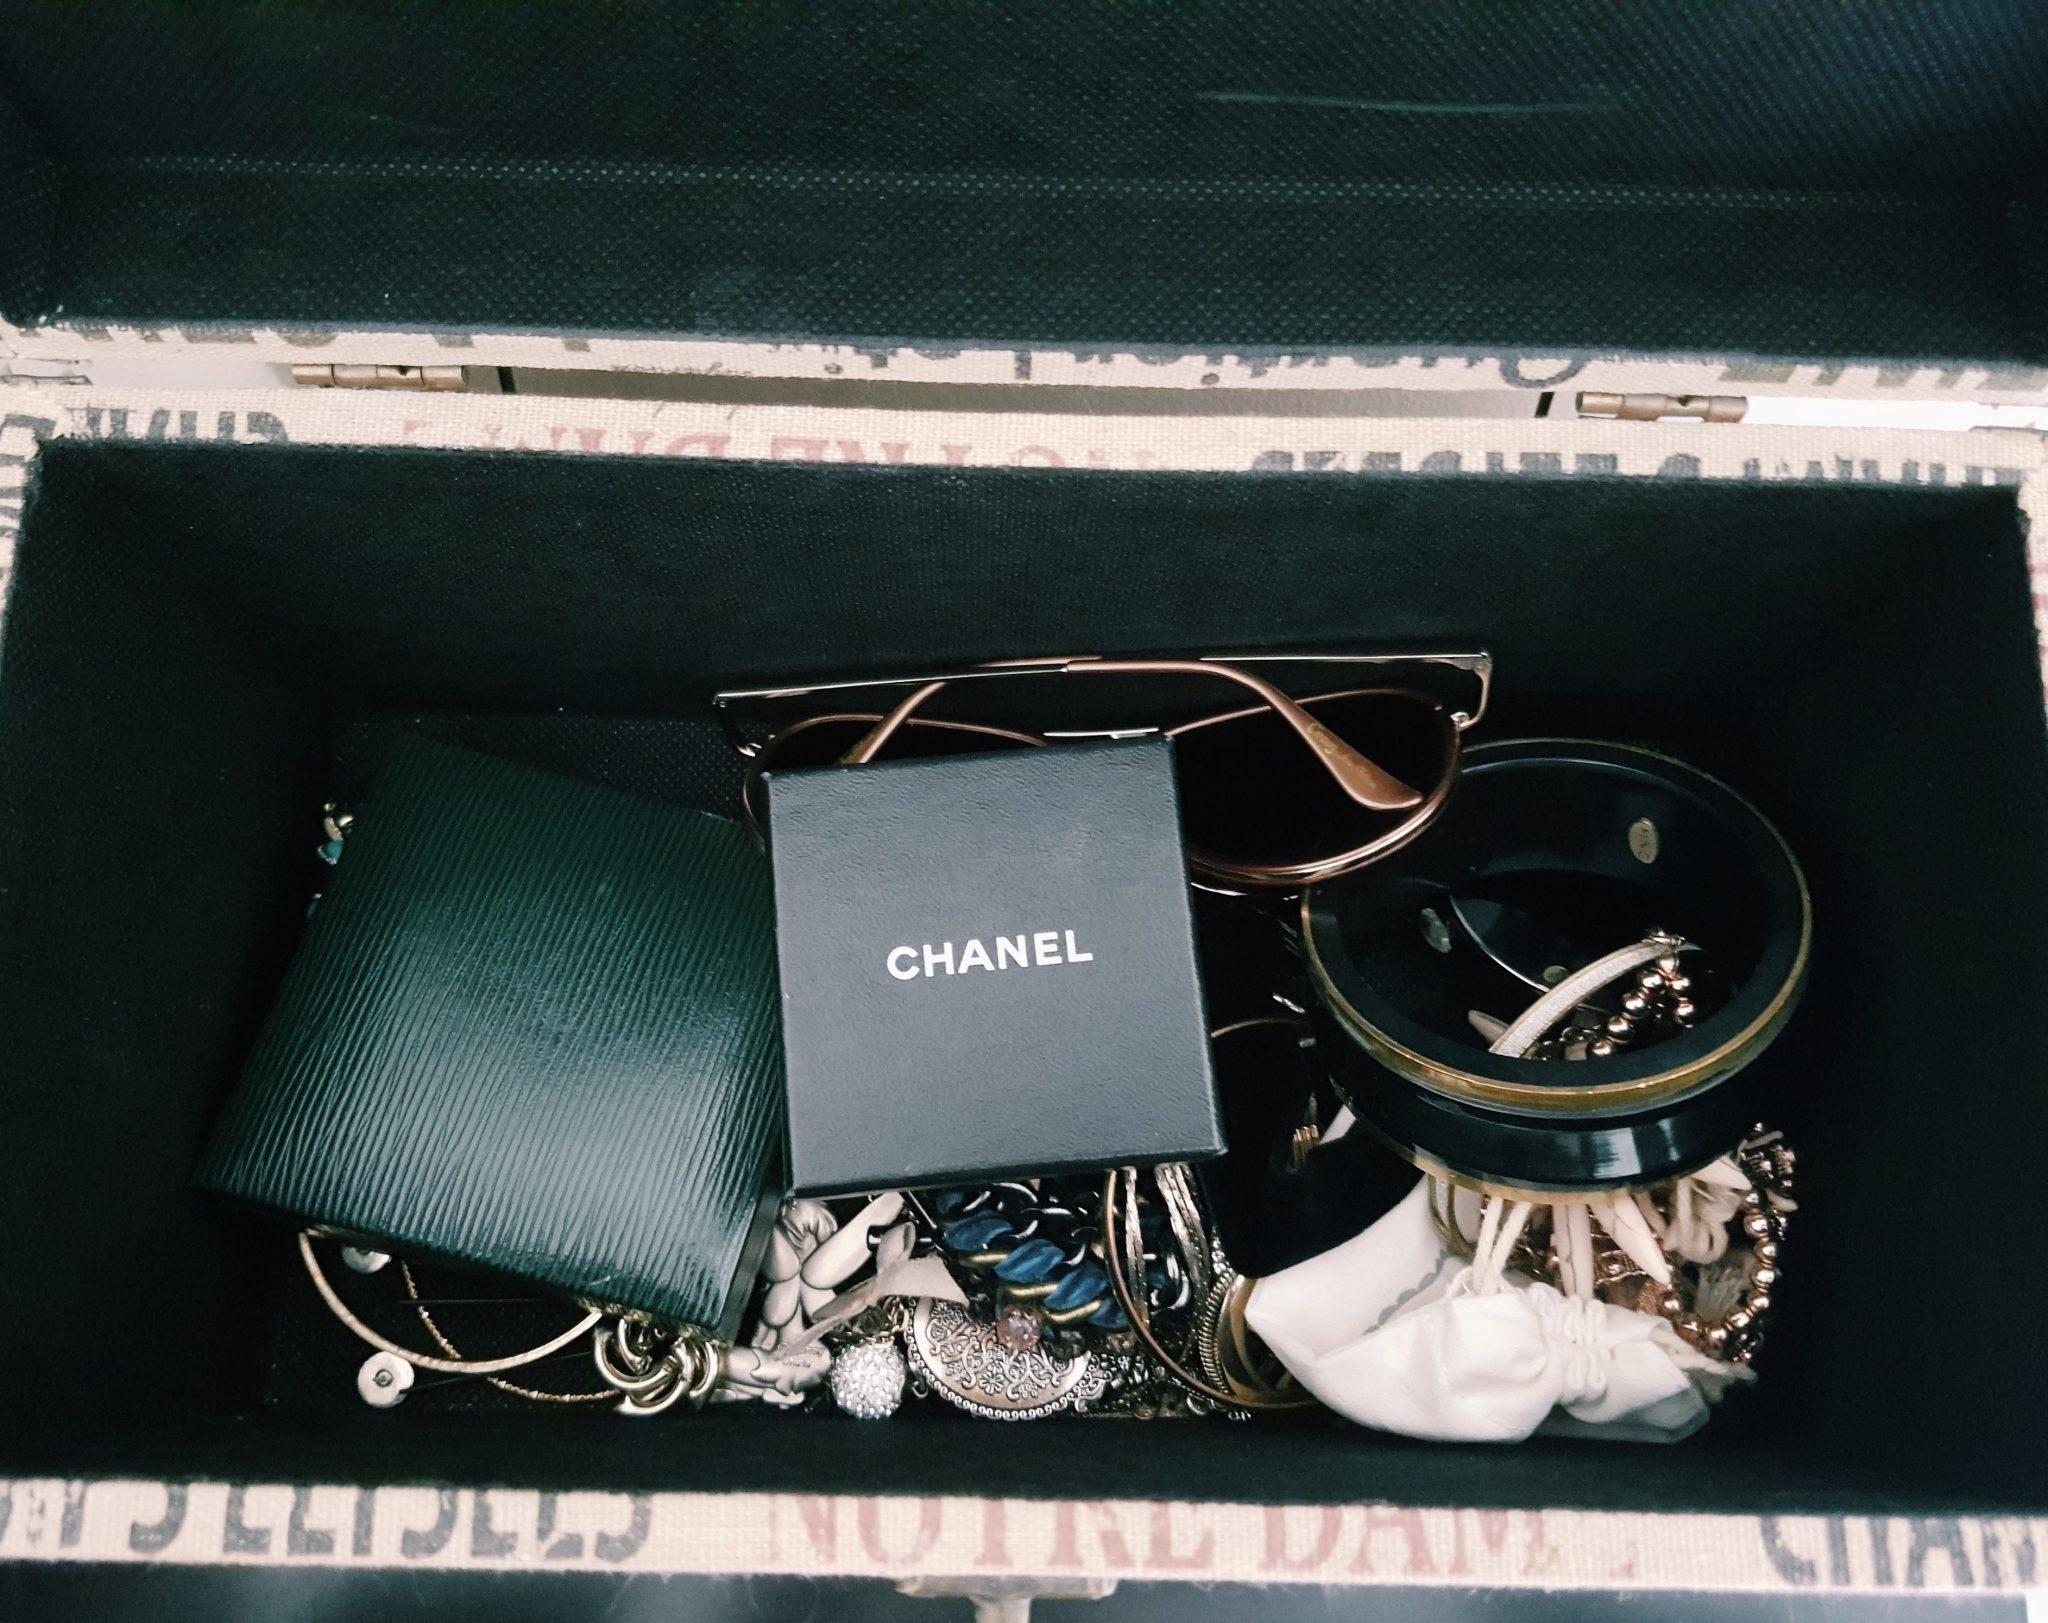 Inside jewellery box